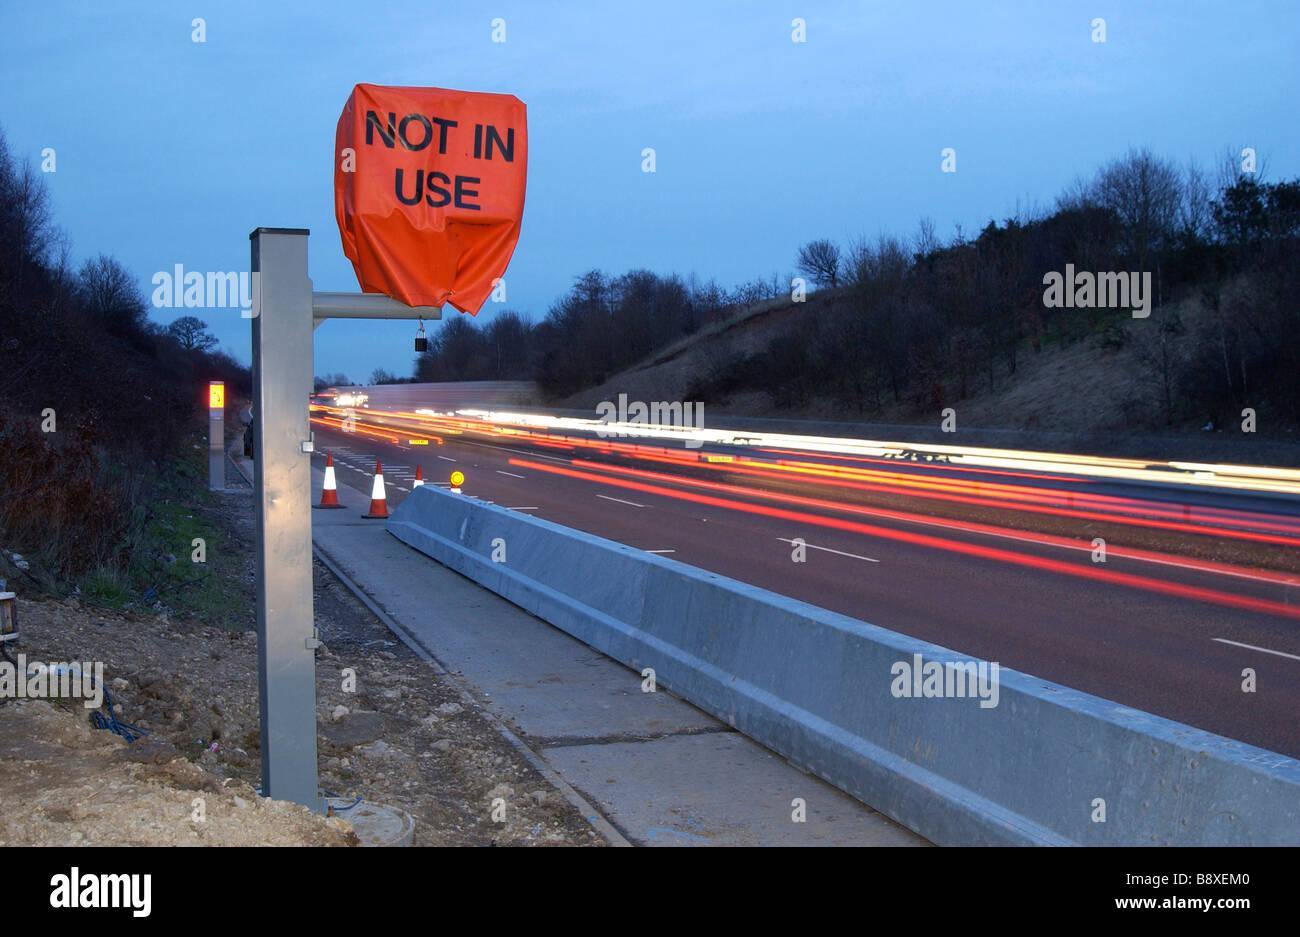 Speed camera not in use speeding road traffic accidents revenue raisers safety cameras motorists  broken speed camera - Stock Image